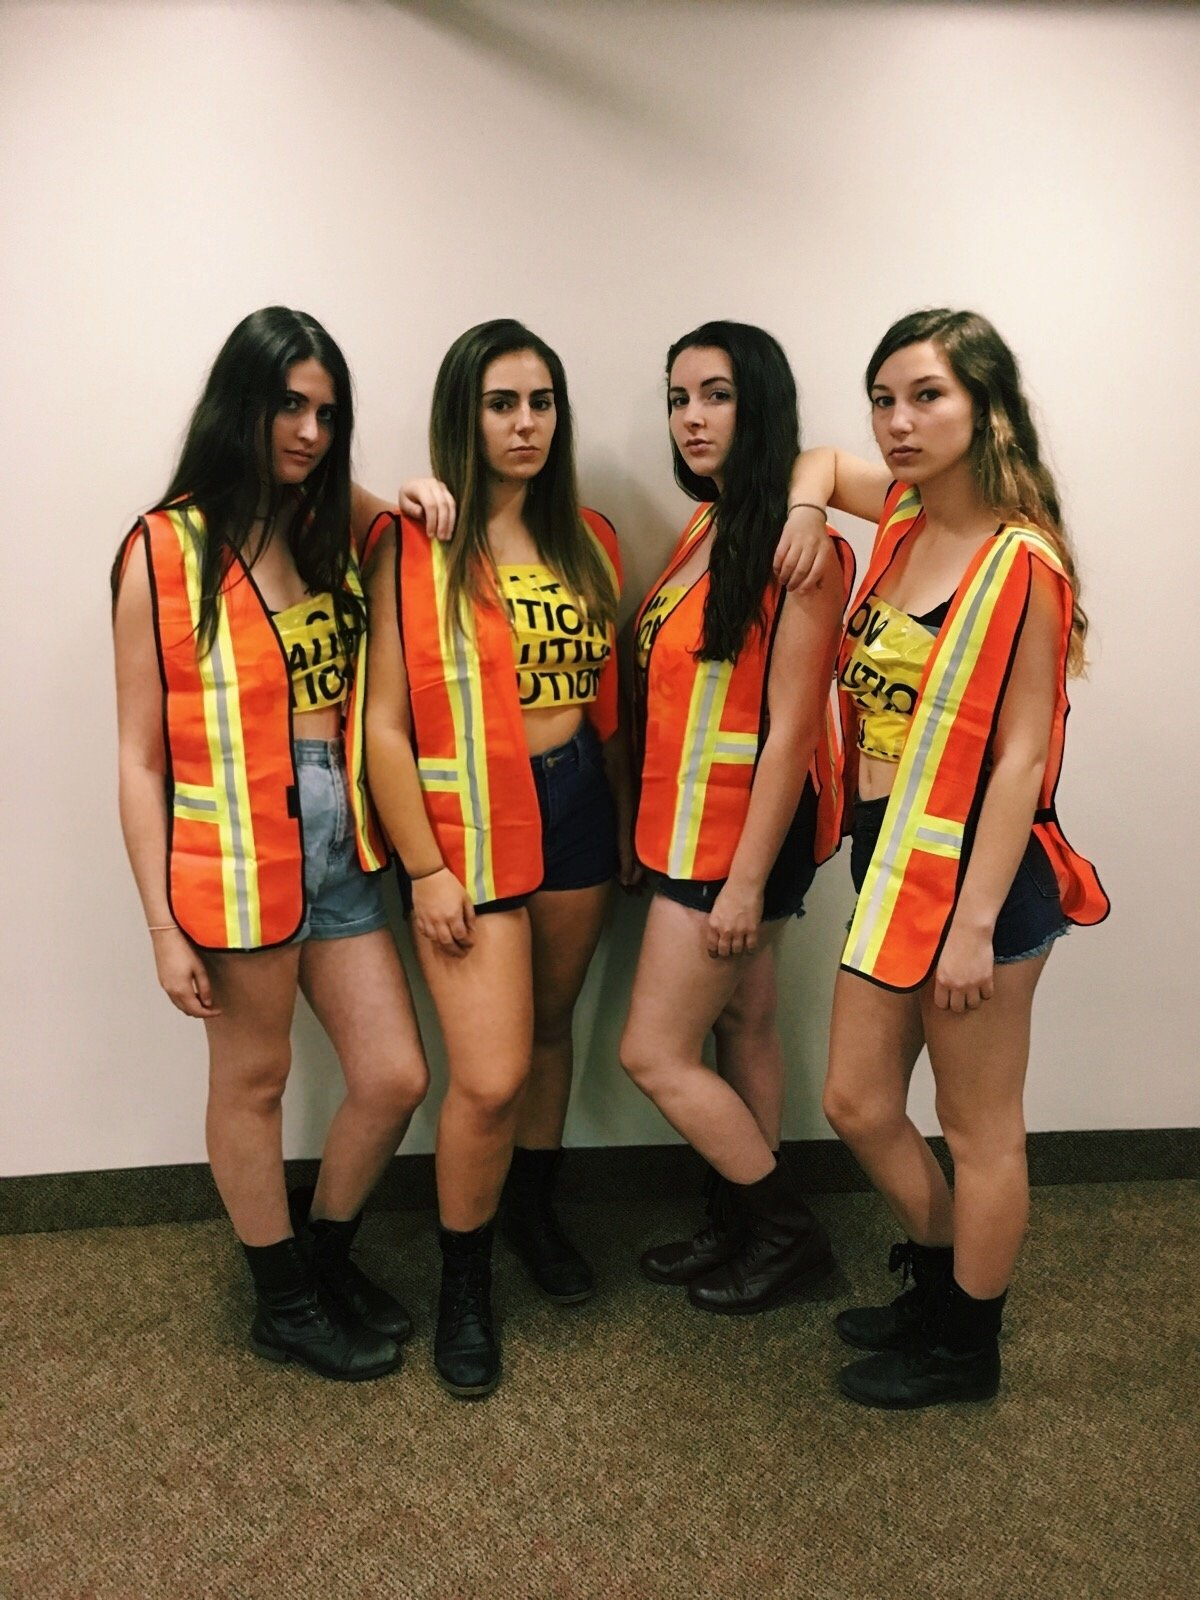 10 Perfect College Girls Halloween Costume Ideas cute halloween costume for college girls halloween pinterest 2 2021